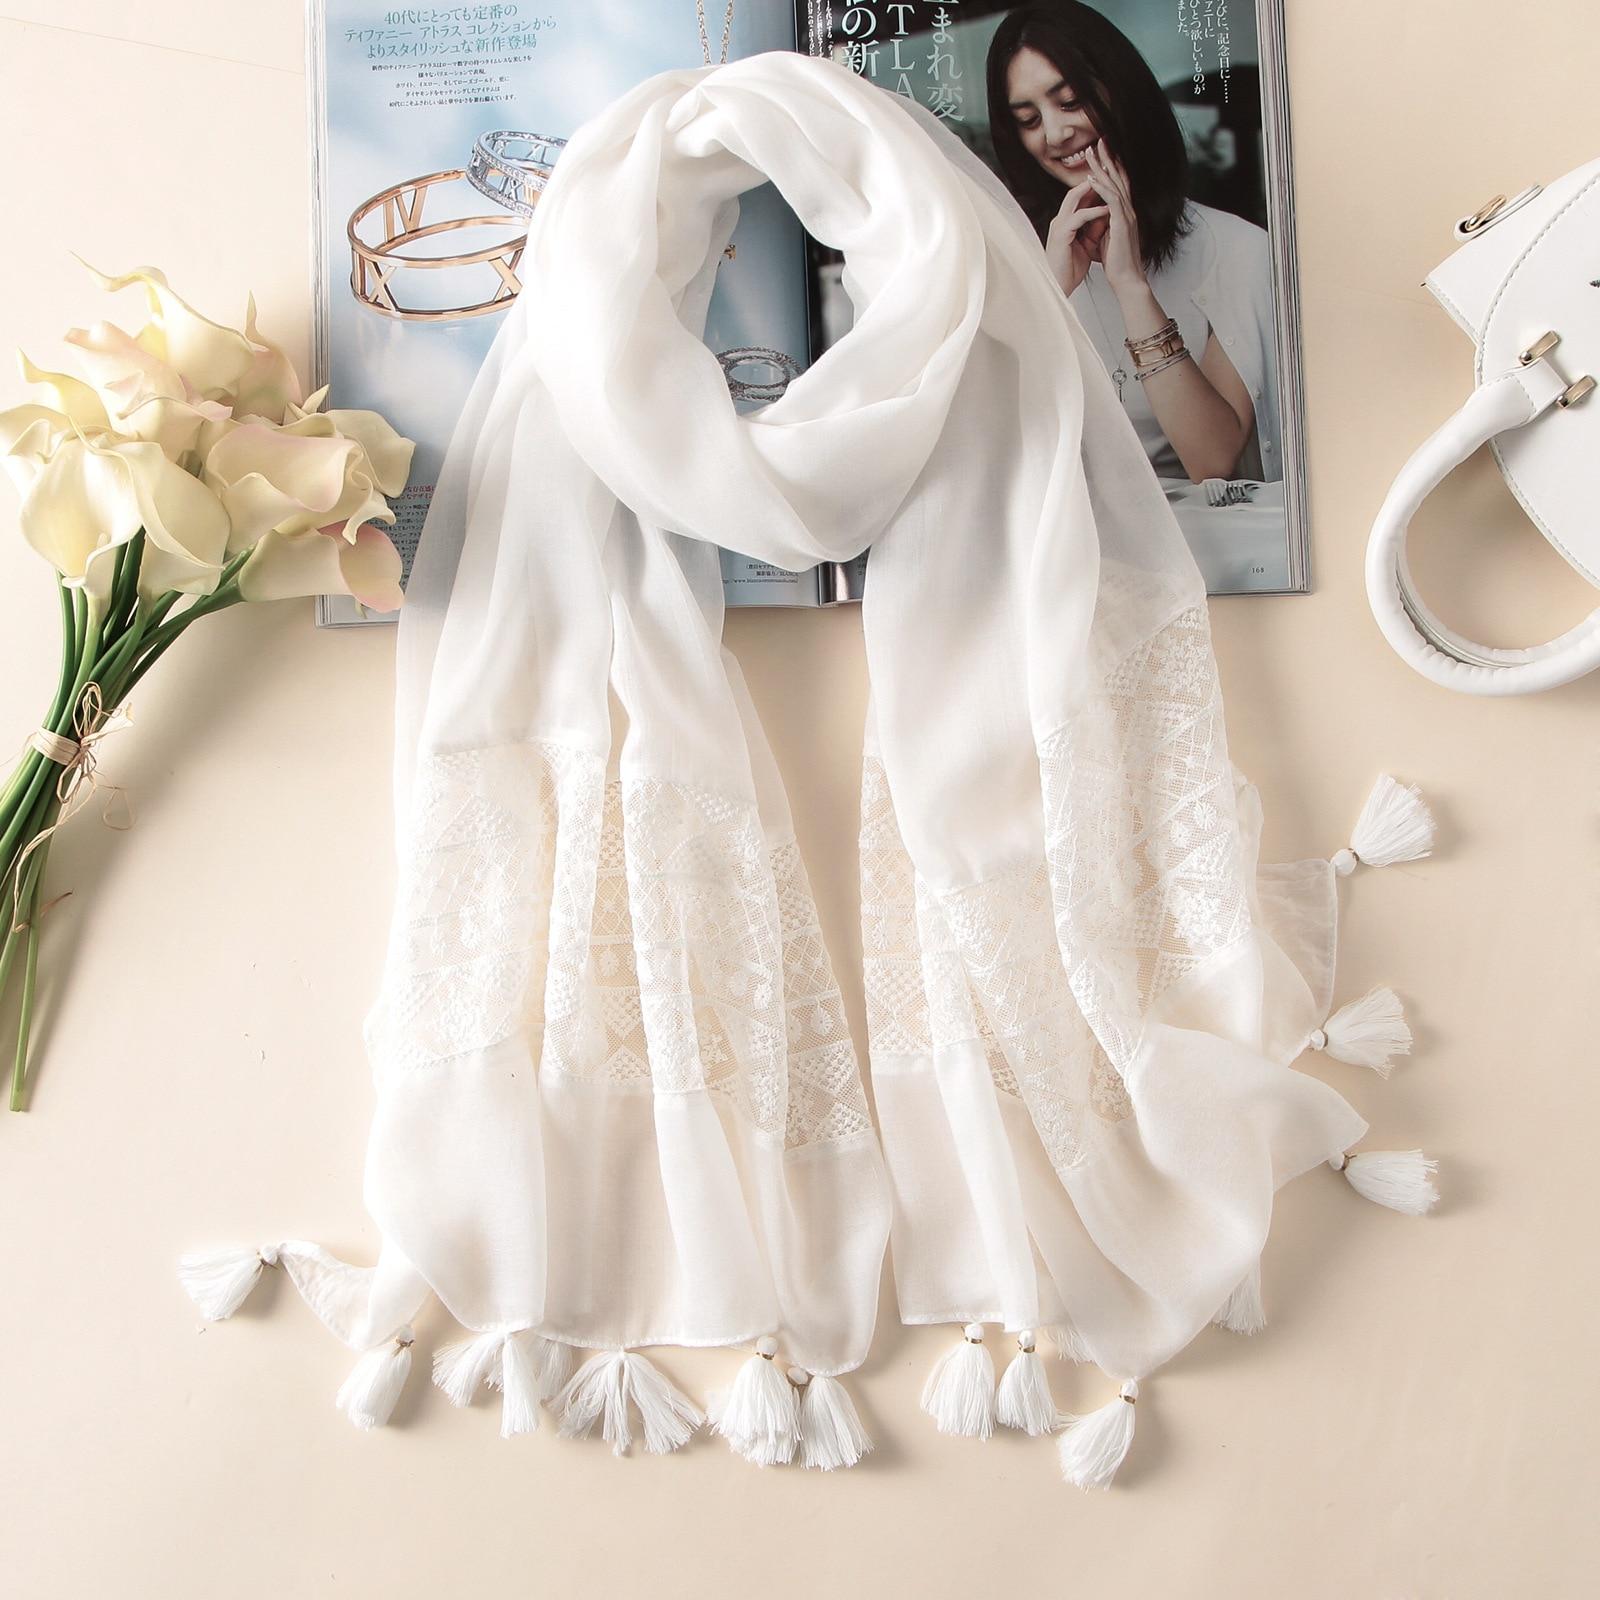 Marca 2018 primavera verano mujeres bufanda de moda de encaje blanco bufandas de seda chales pashmina bandana hembra foulard pareo playa